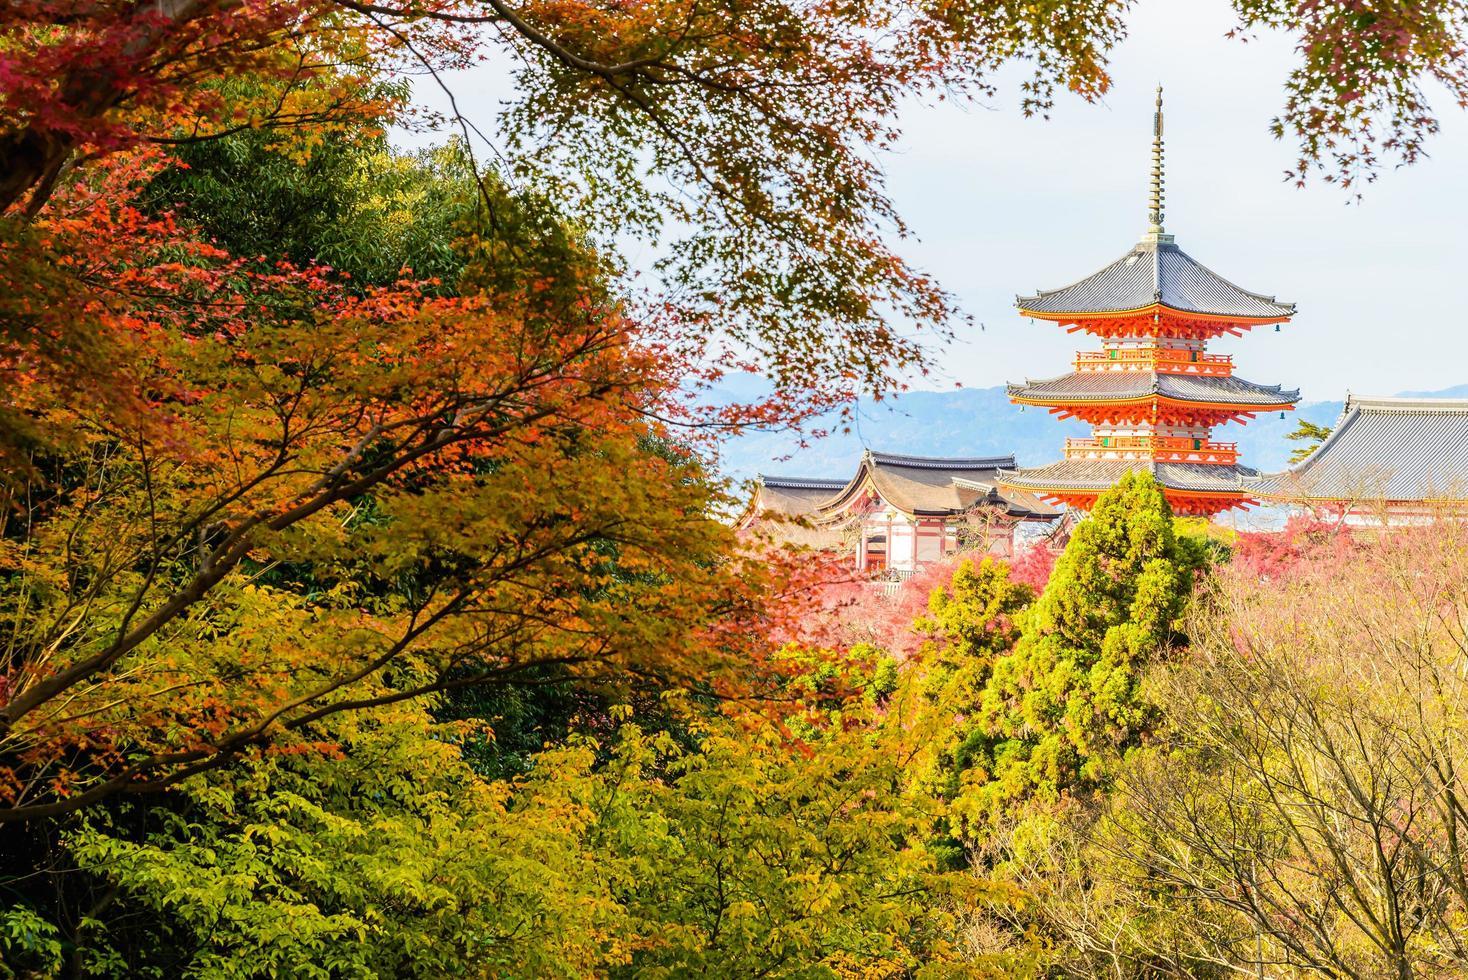 Kiyomizu dera temple in Kyoto, Japan photo